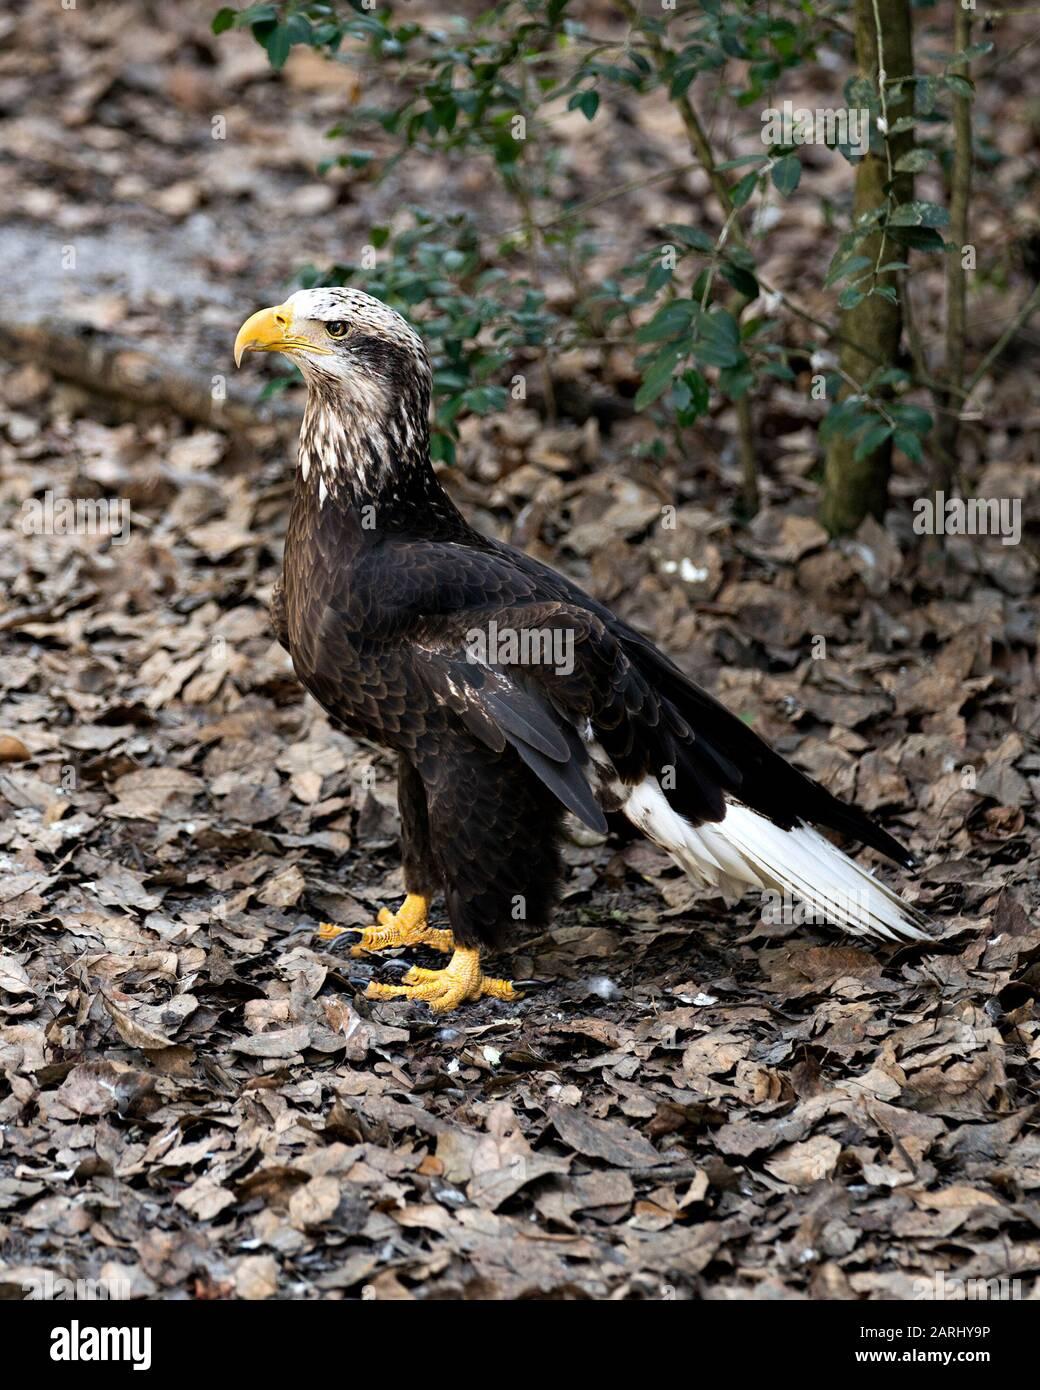 Eagle Talon Bird : eagle, talon, Eagle, Juvenile, Close-up, Profile, Displaying, Feathers,, White, Head,, Beak,, Talons,, Plumage,, Tail,, Surrounding, Environ, Stock, Photo, Alamy